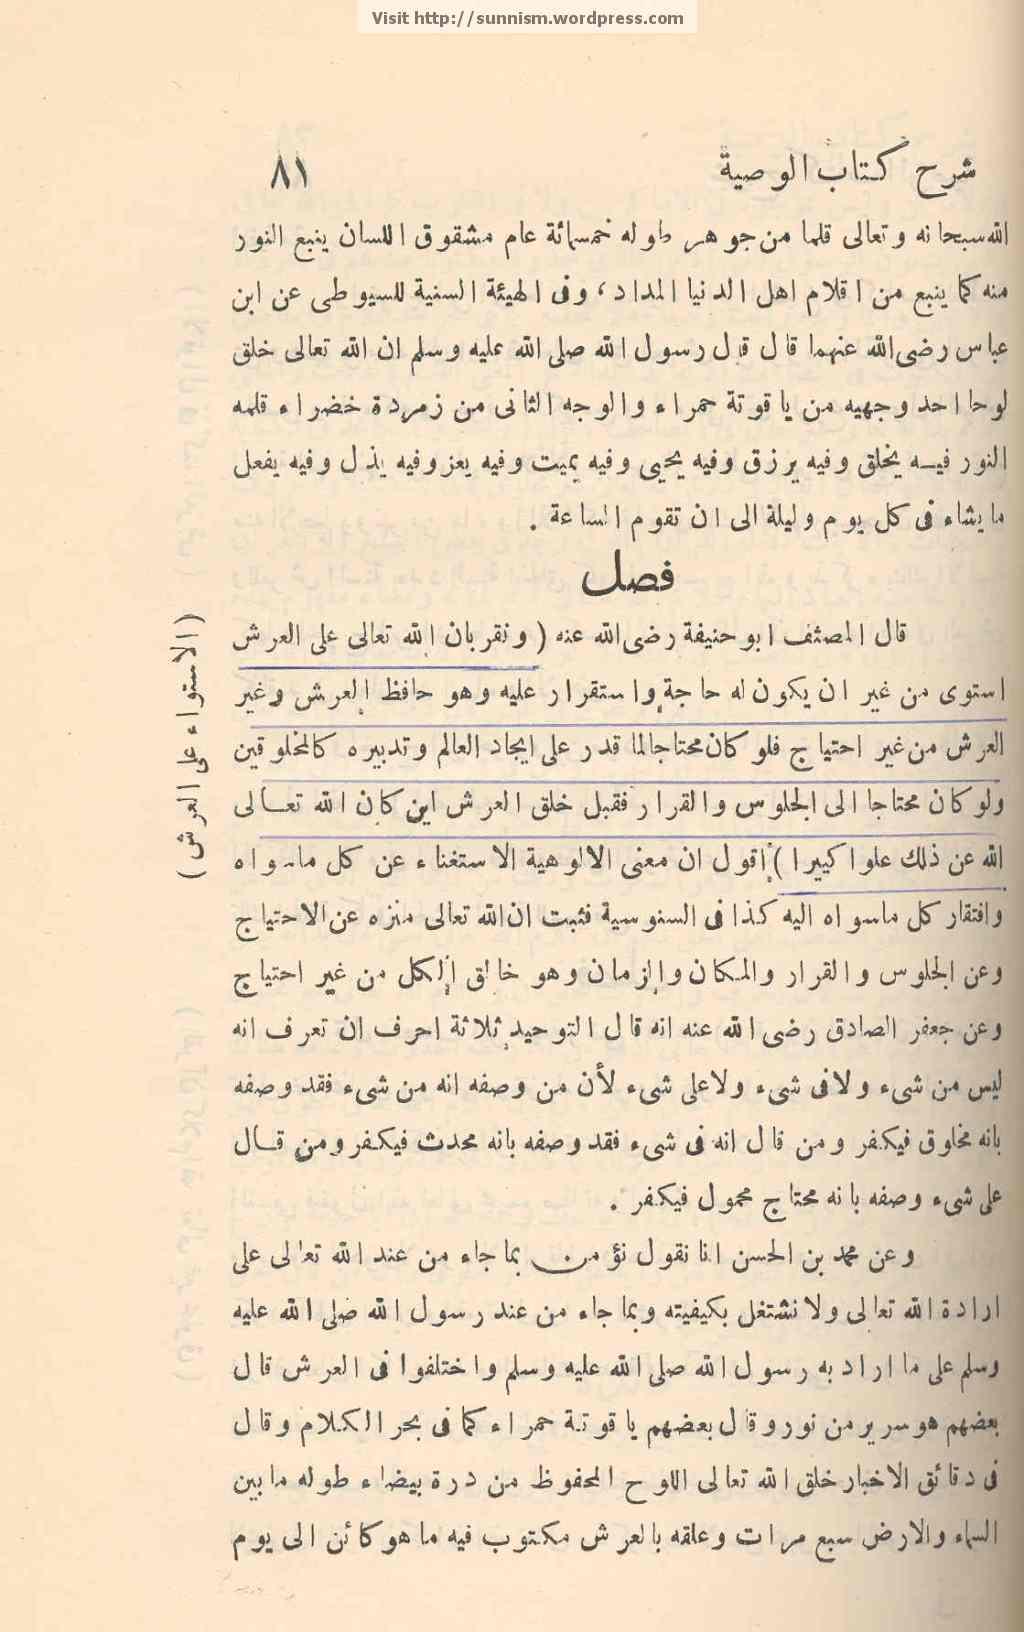 Imam Abu Hanifah (from the SALAF) does say that 'Istiwa